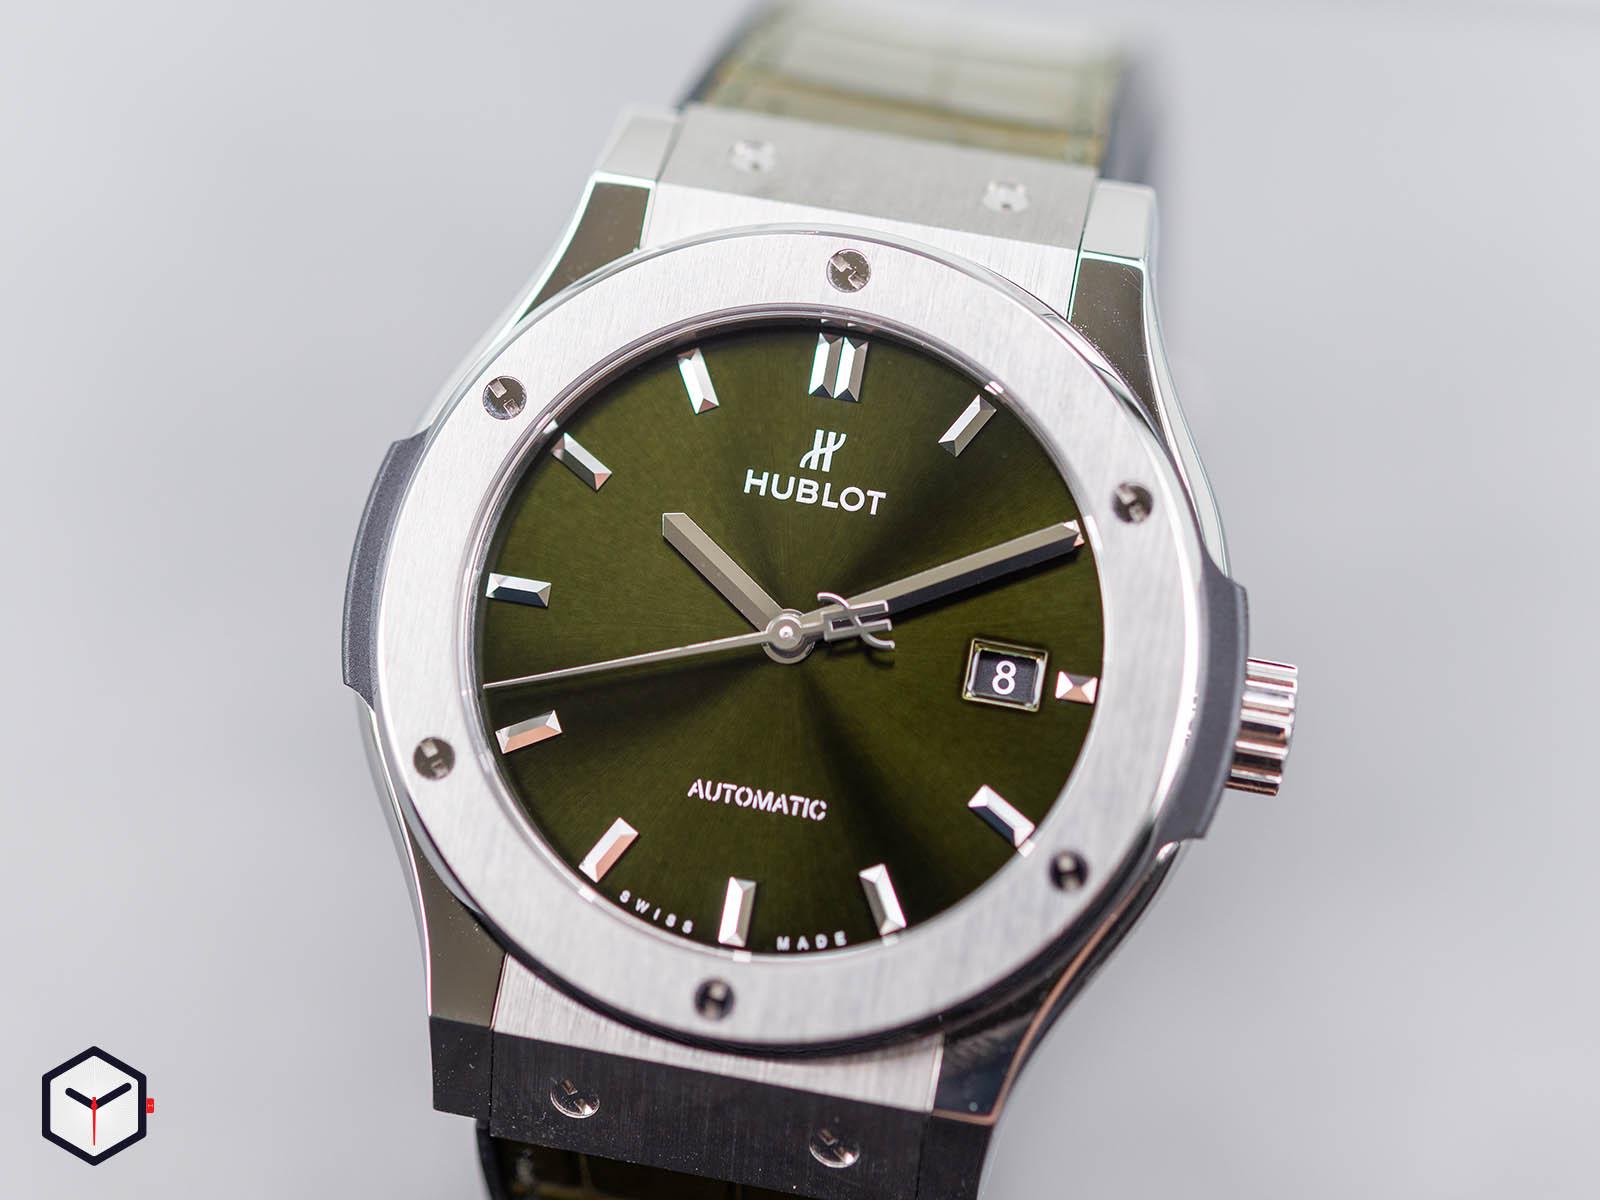 565-nx-8970-lr-hublot-classic-fusion-green-titanium-38mm-1.jpg